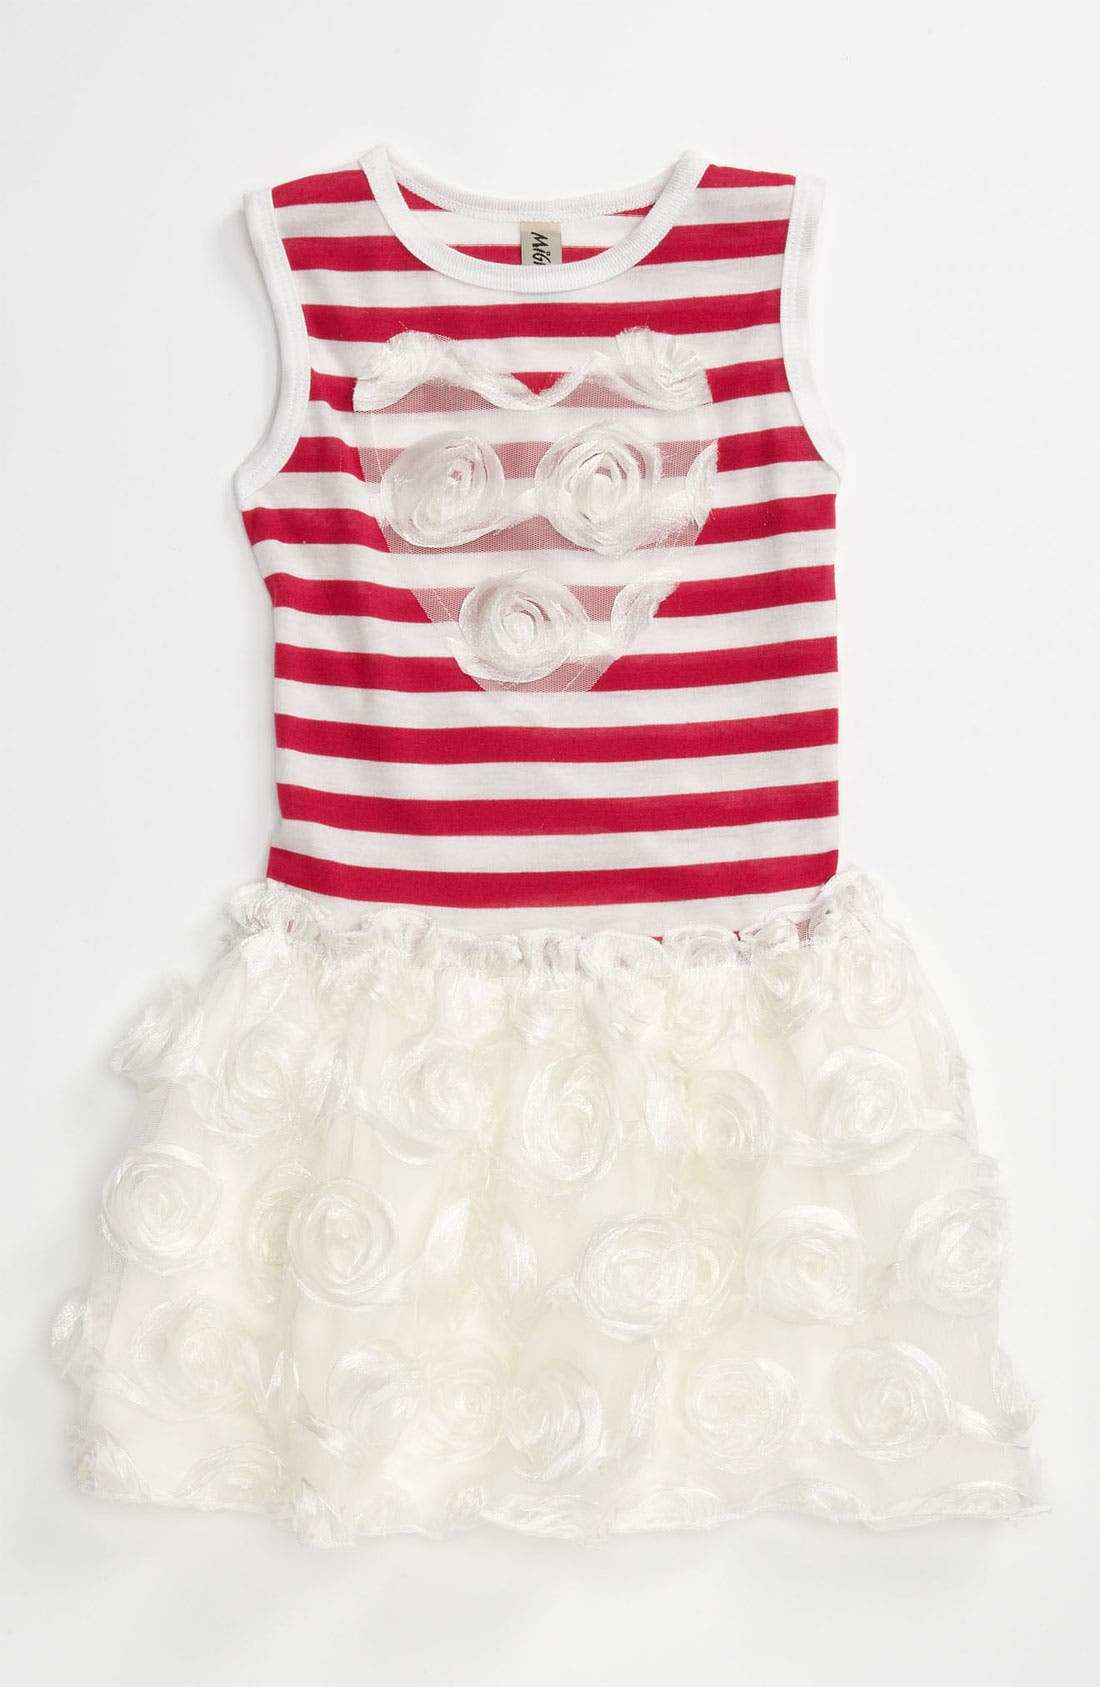 Main Image - Mignone Rosette Stripe Dress (Toddler)